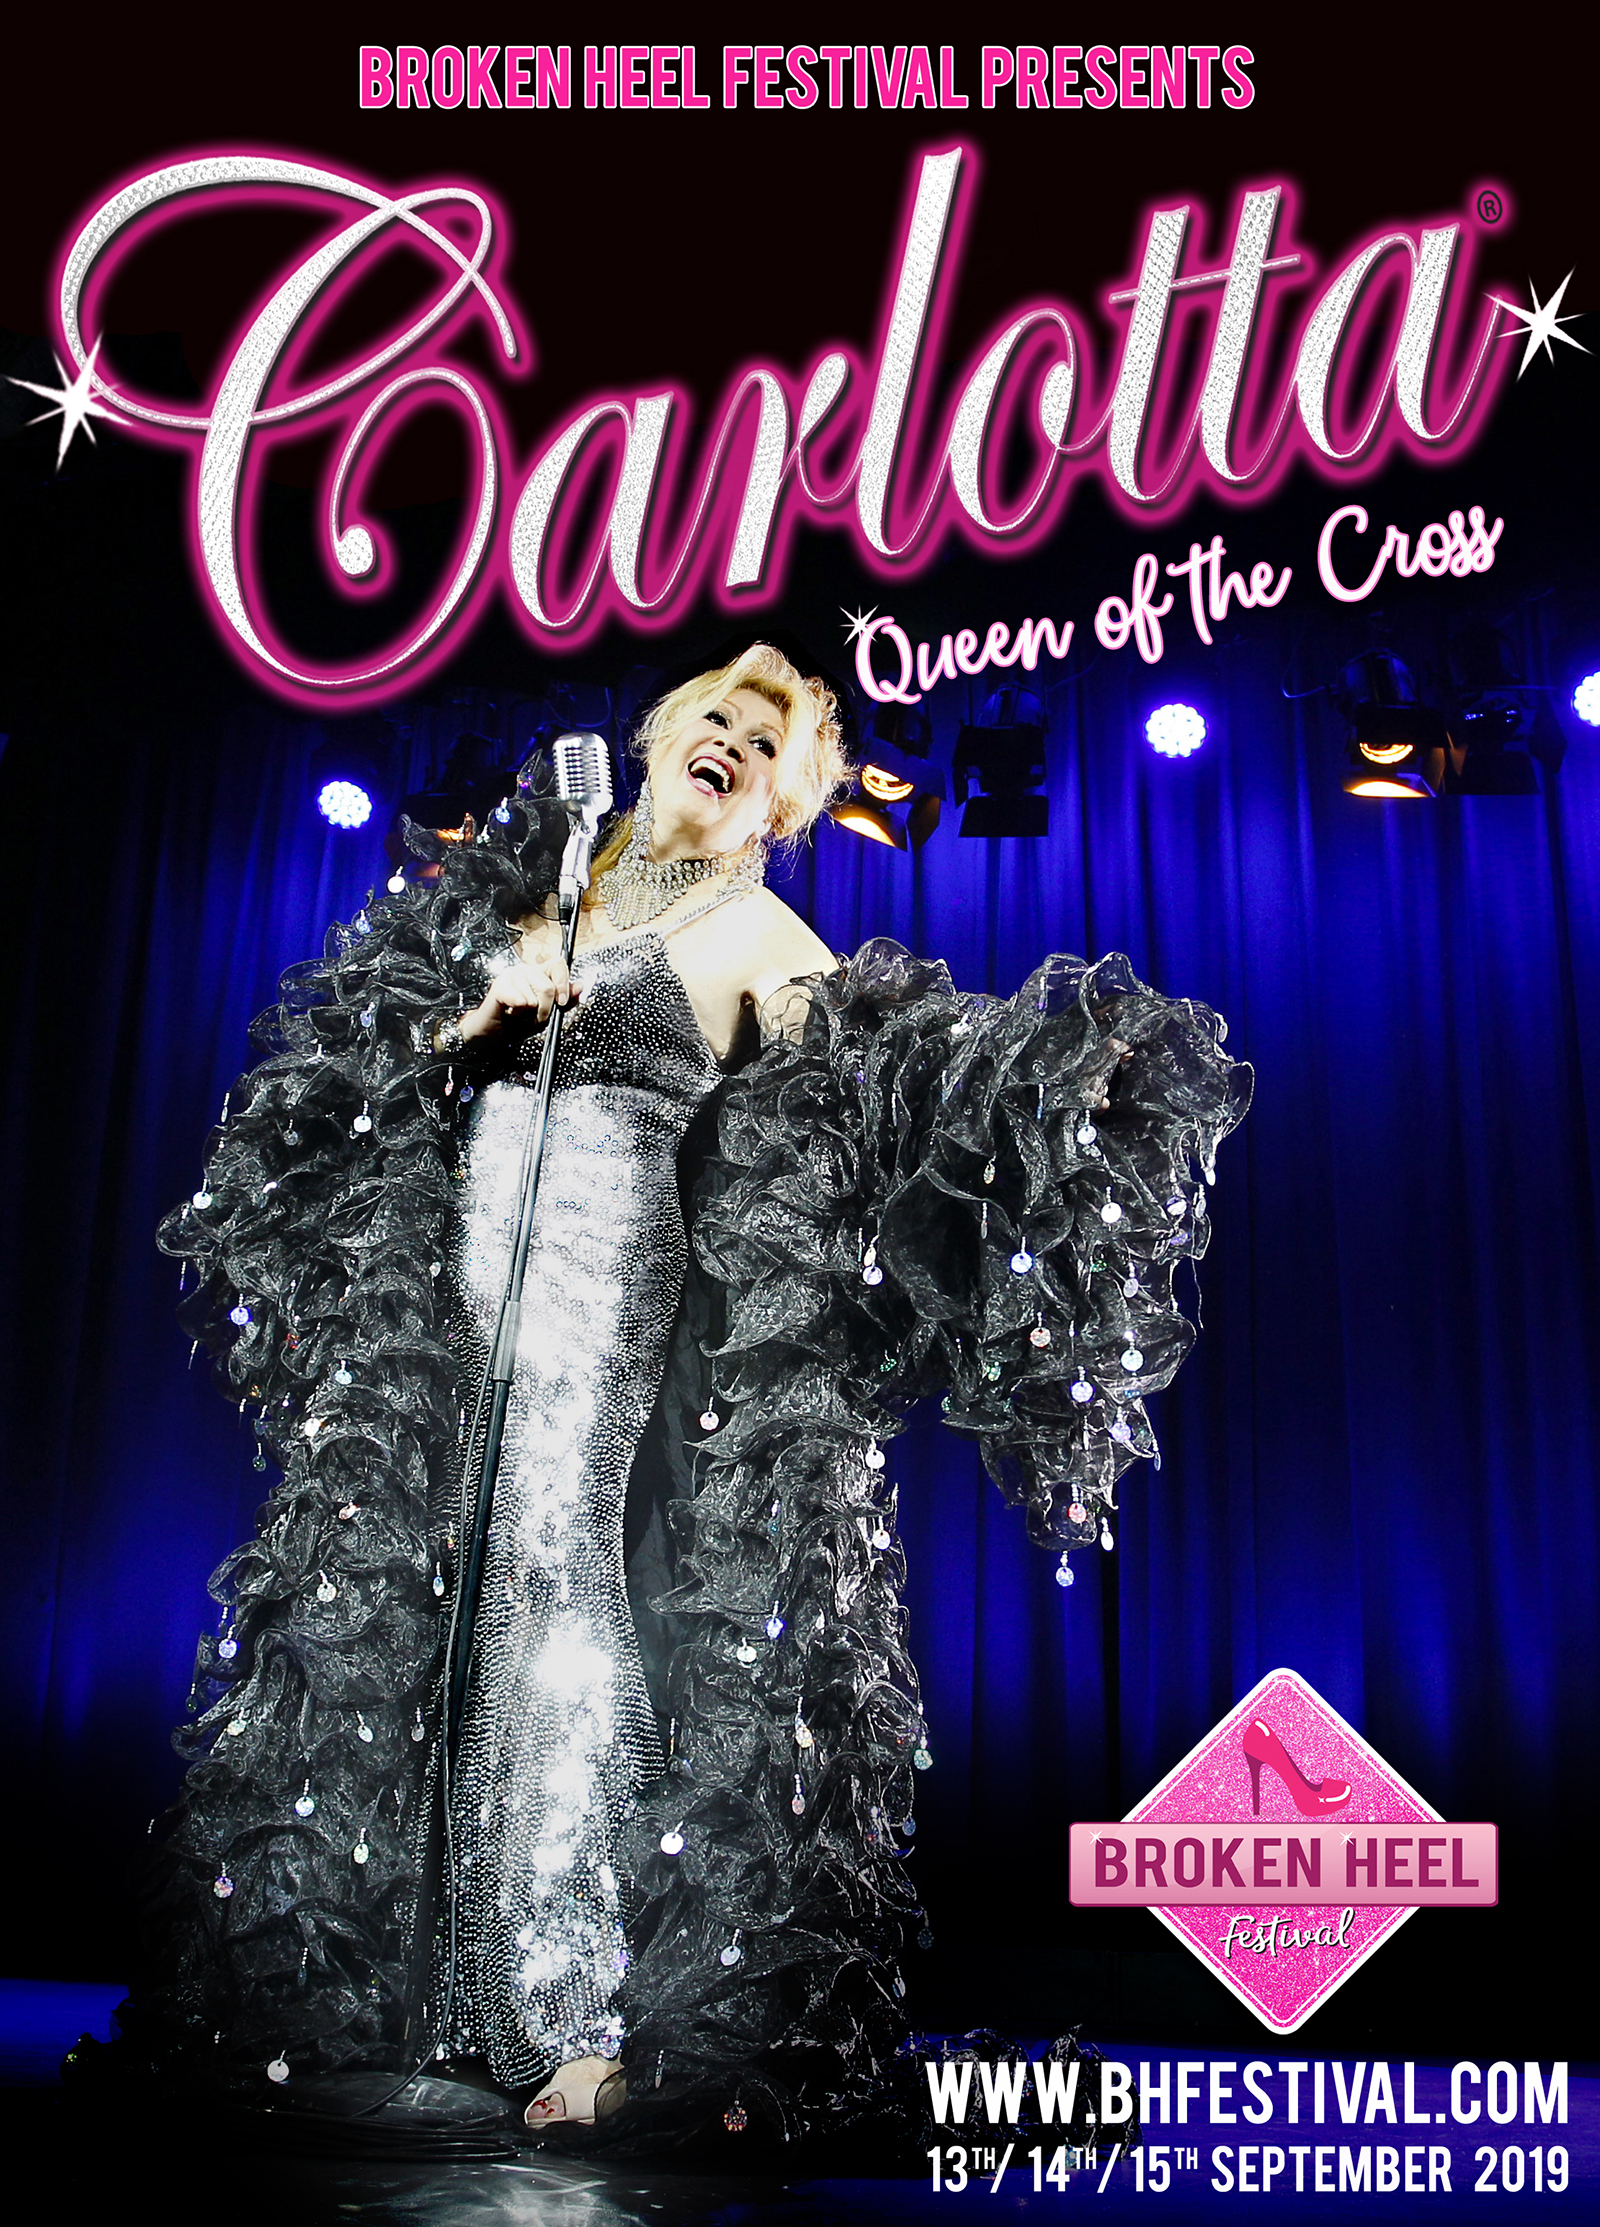 Carlotta BHF2019_s.jpg